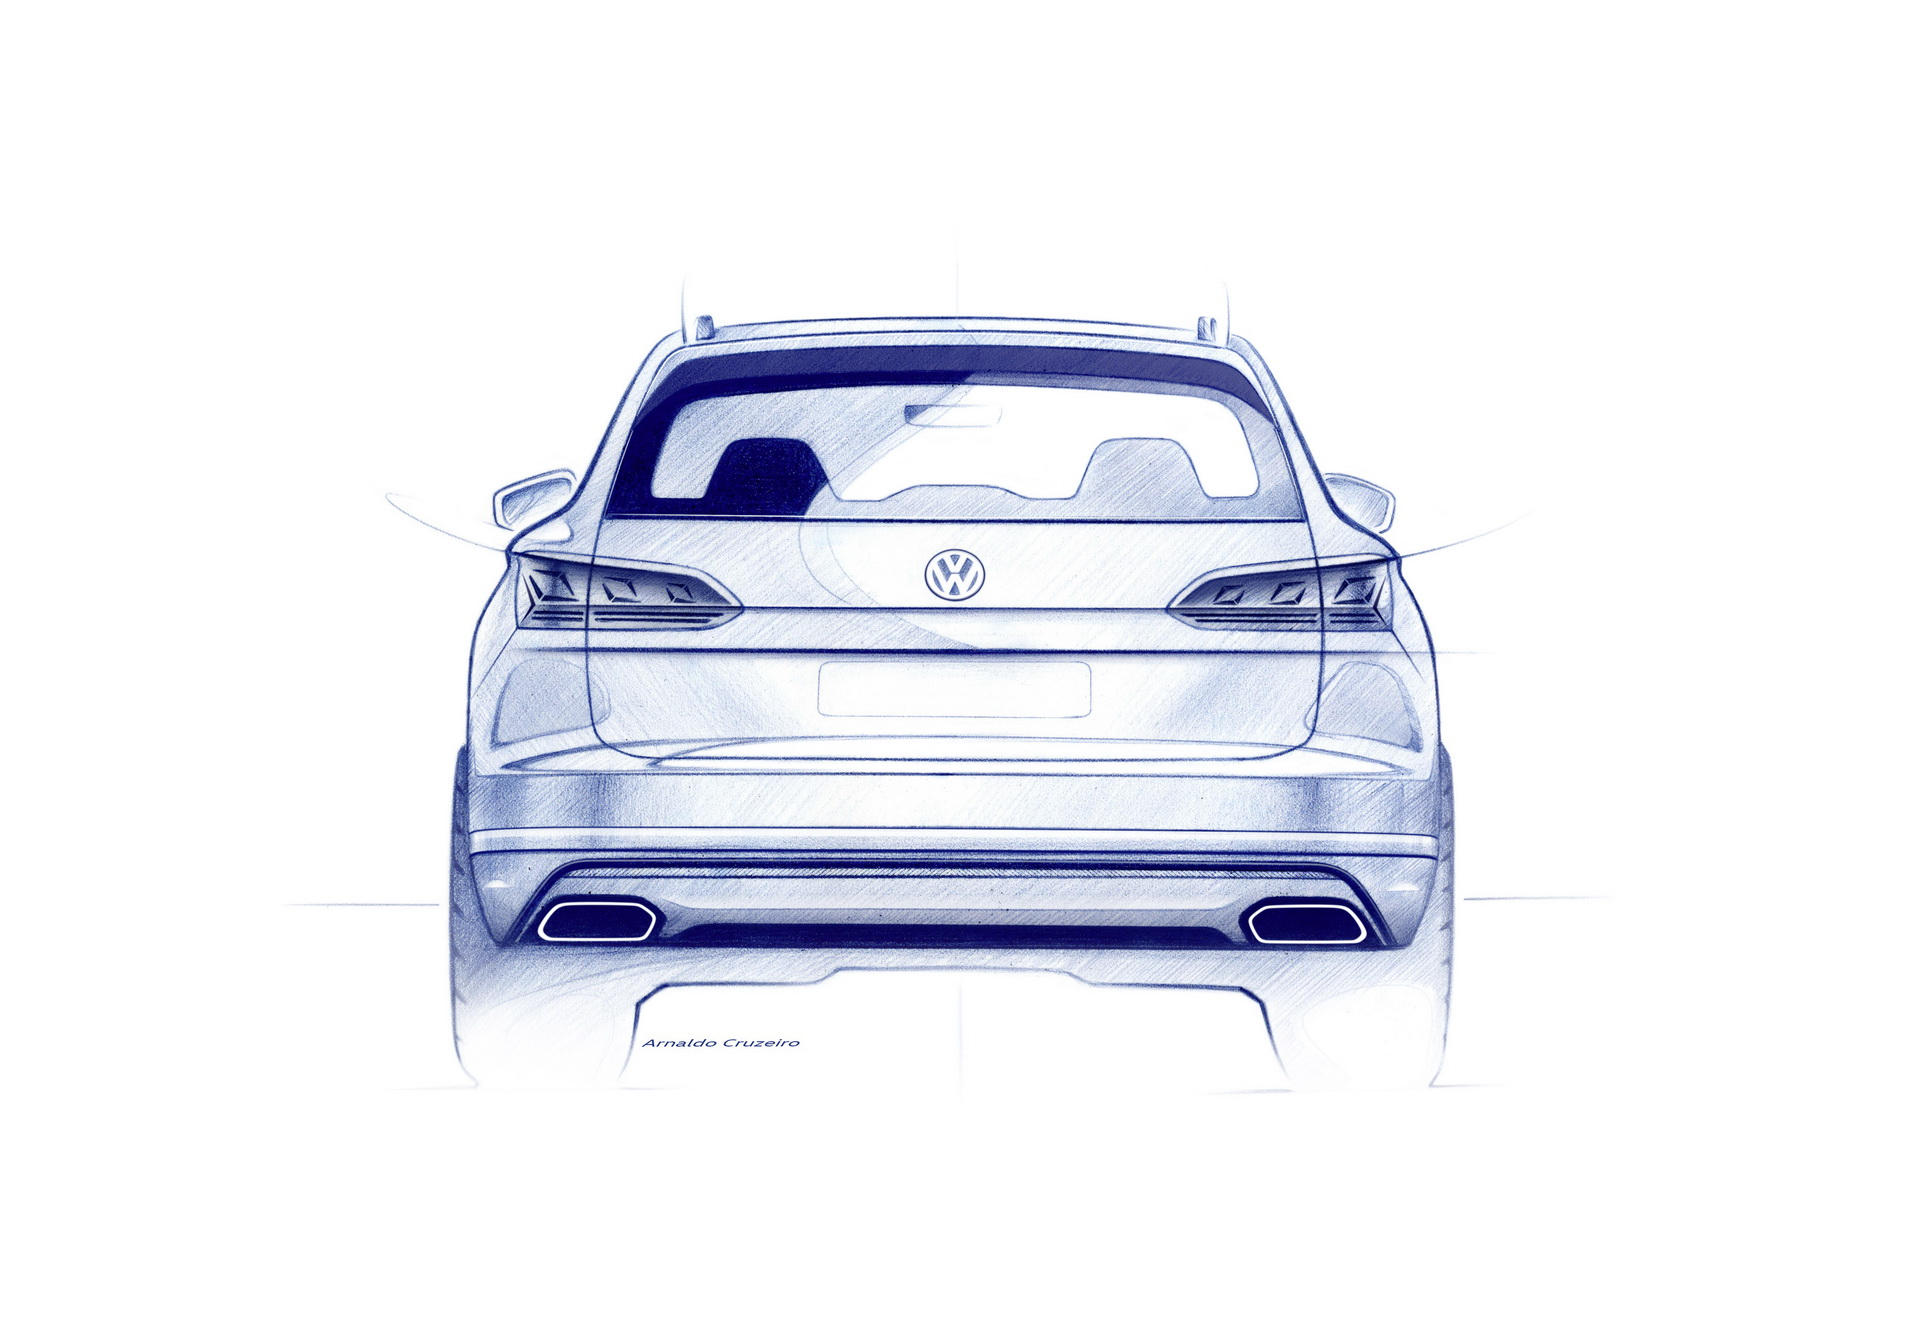 Volkswagen Touareg 2018 (53)